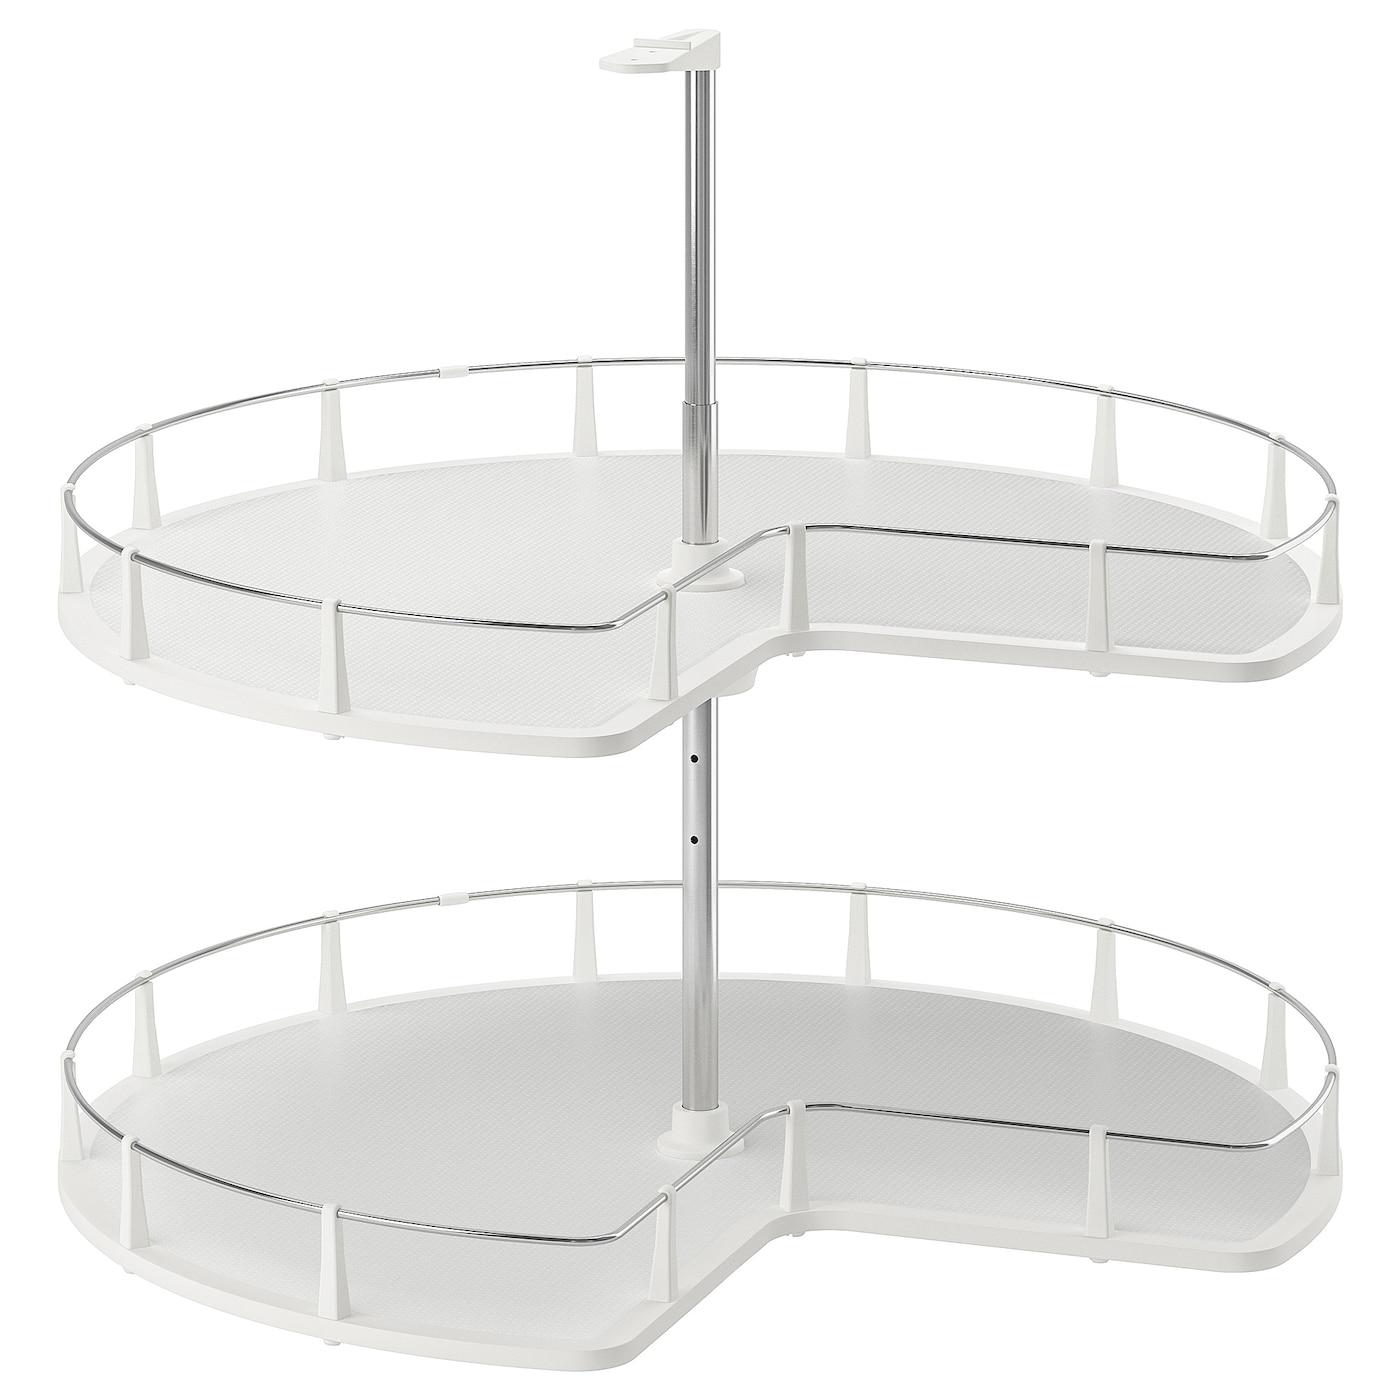 Utrusta Corner Base Cabinet Carousel Ikea,Reflections Bedroom Set